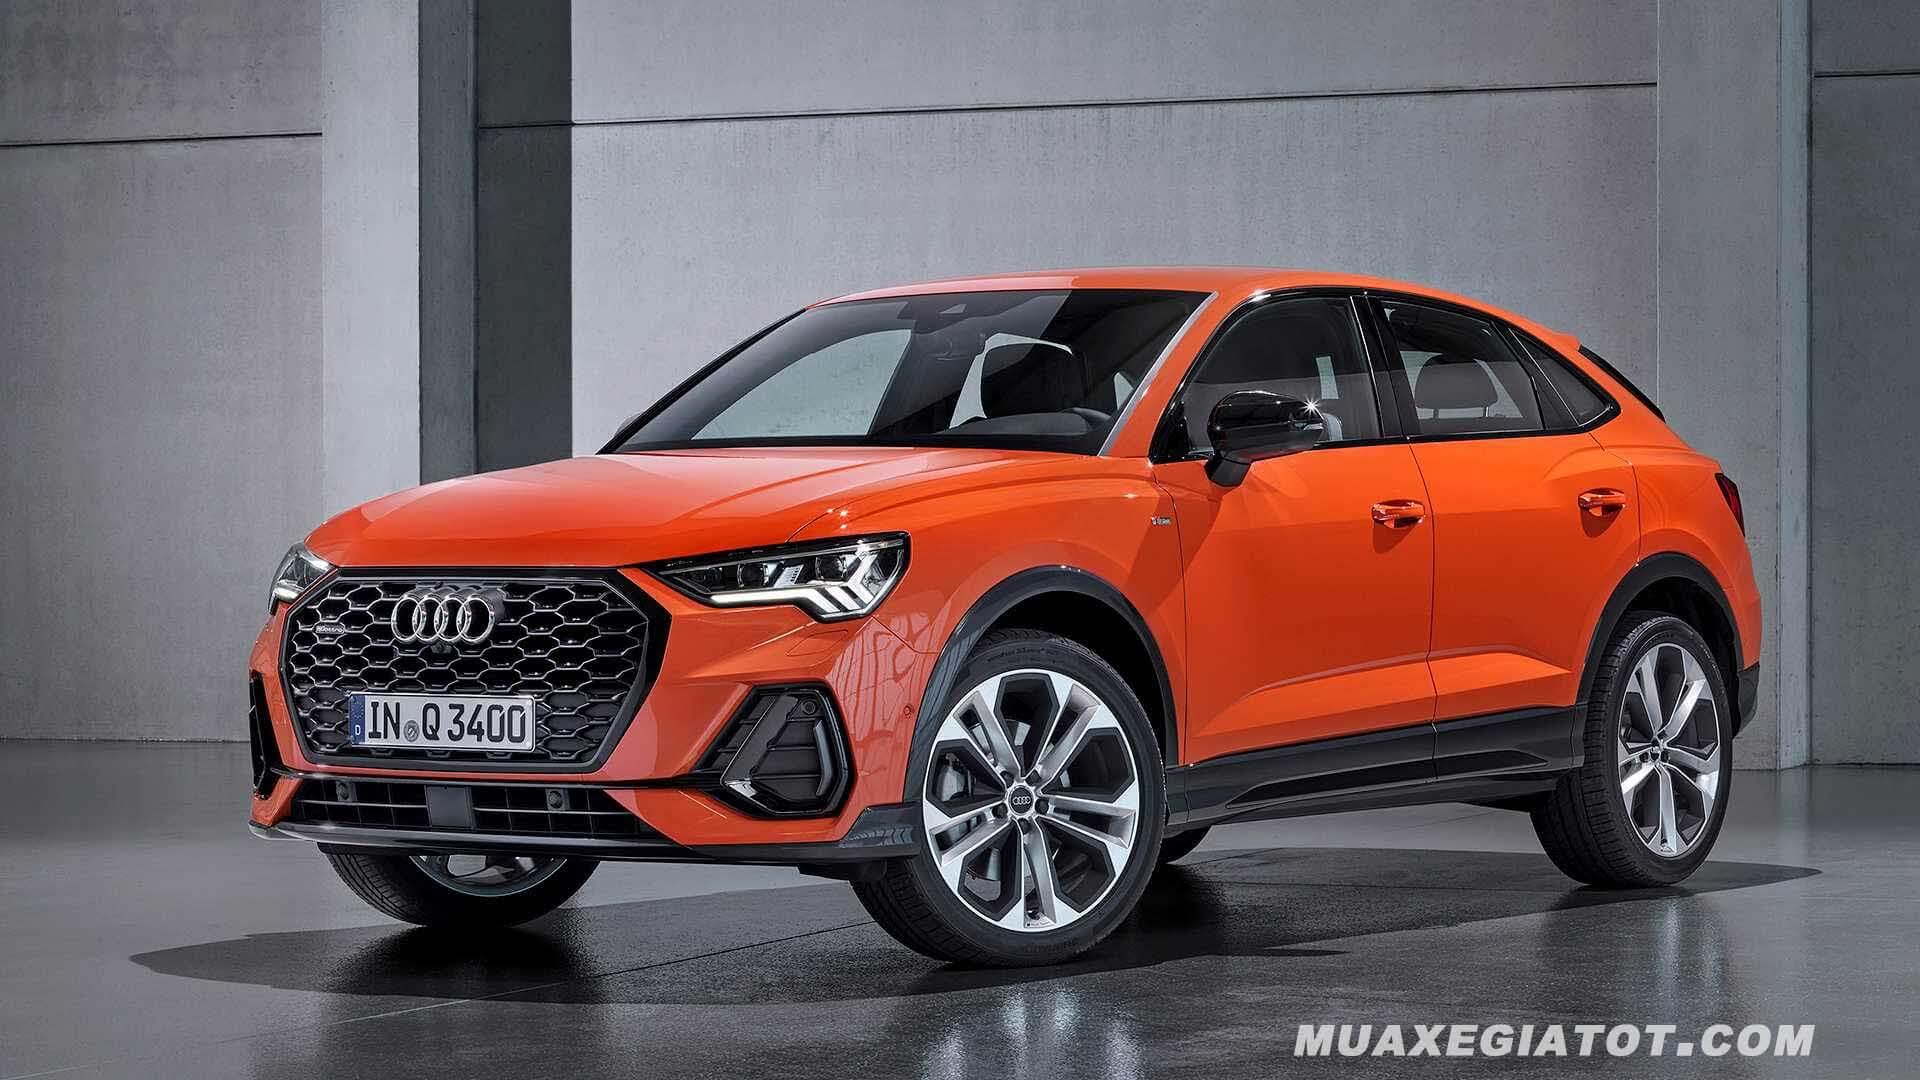 xe-audi-q3-sportback-2020-muaxegiatot-com